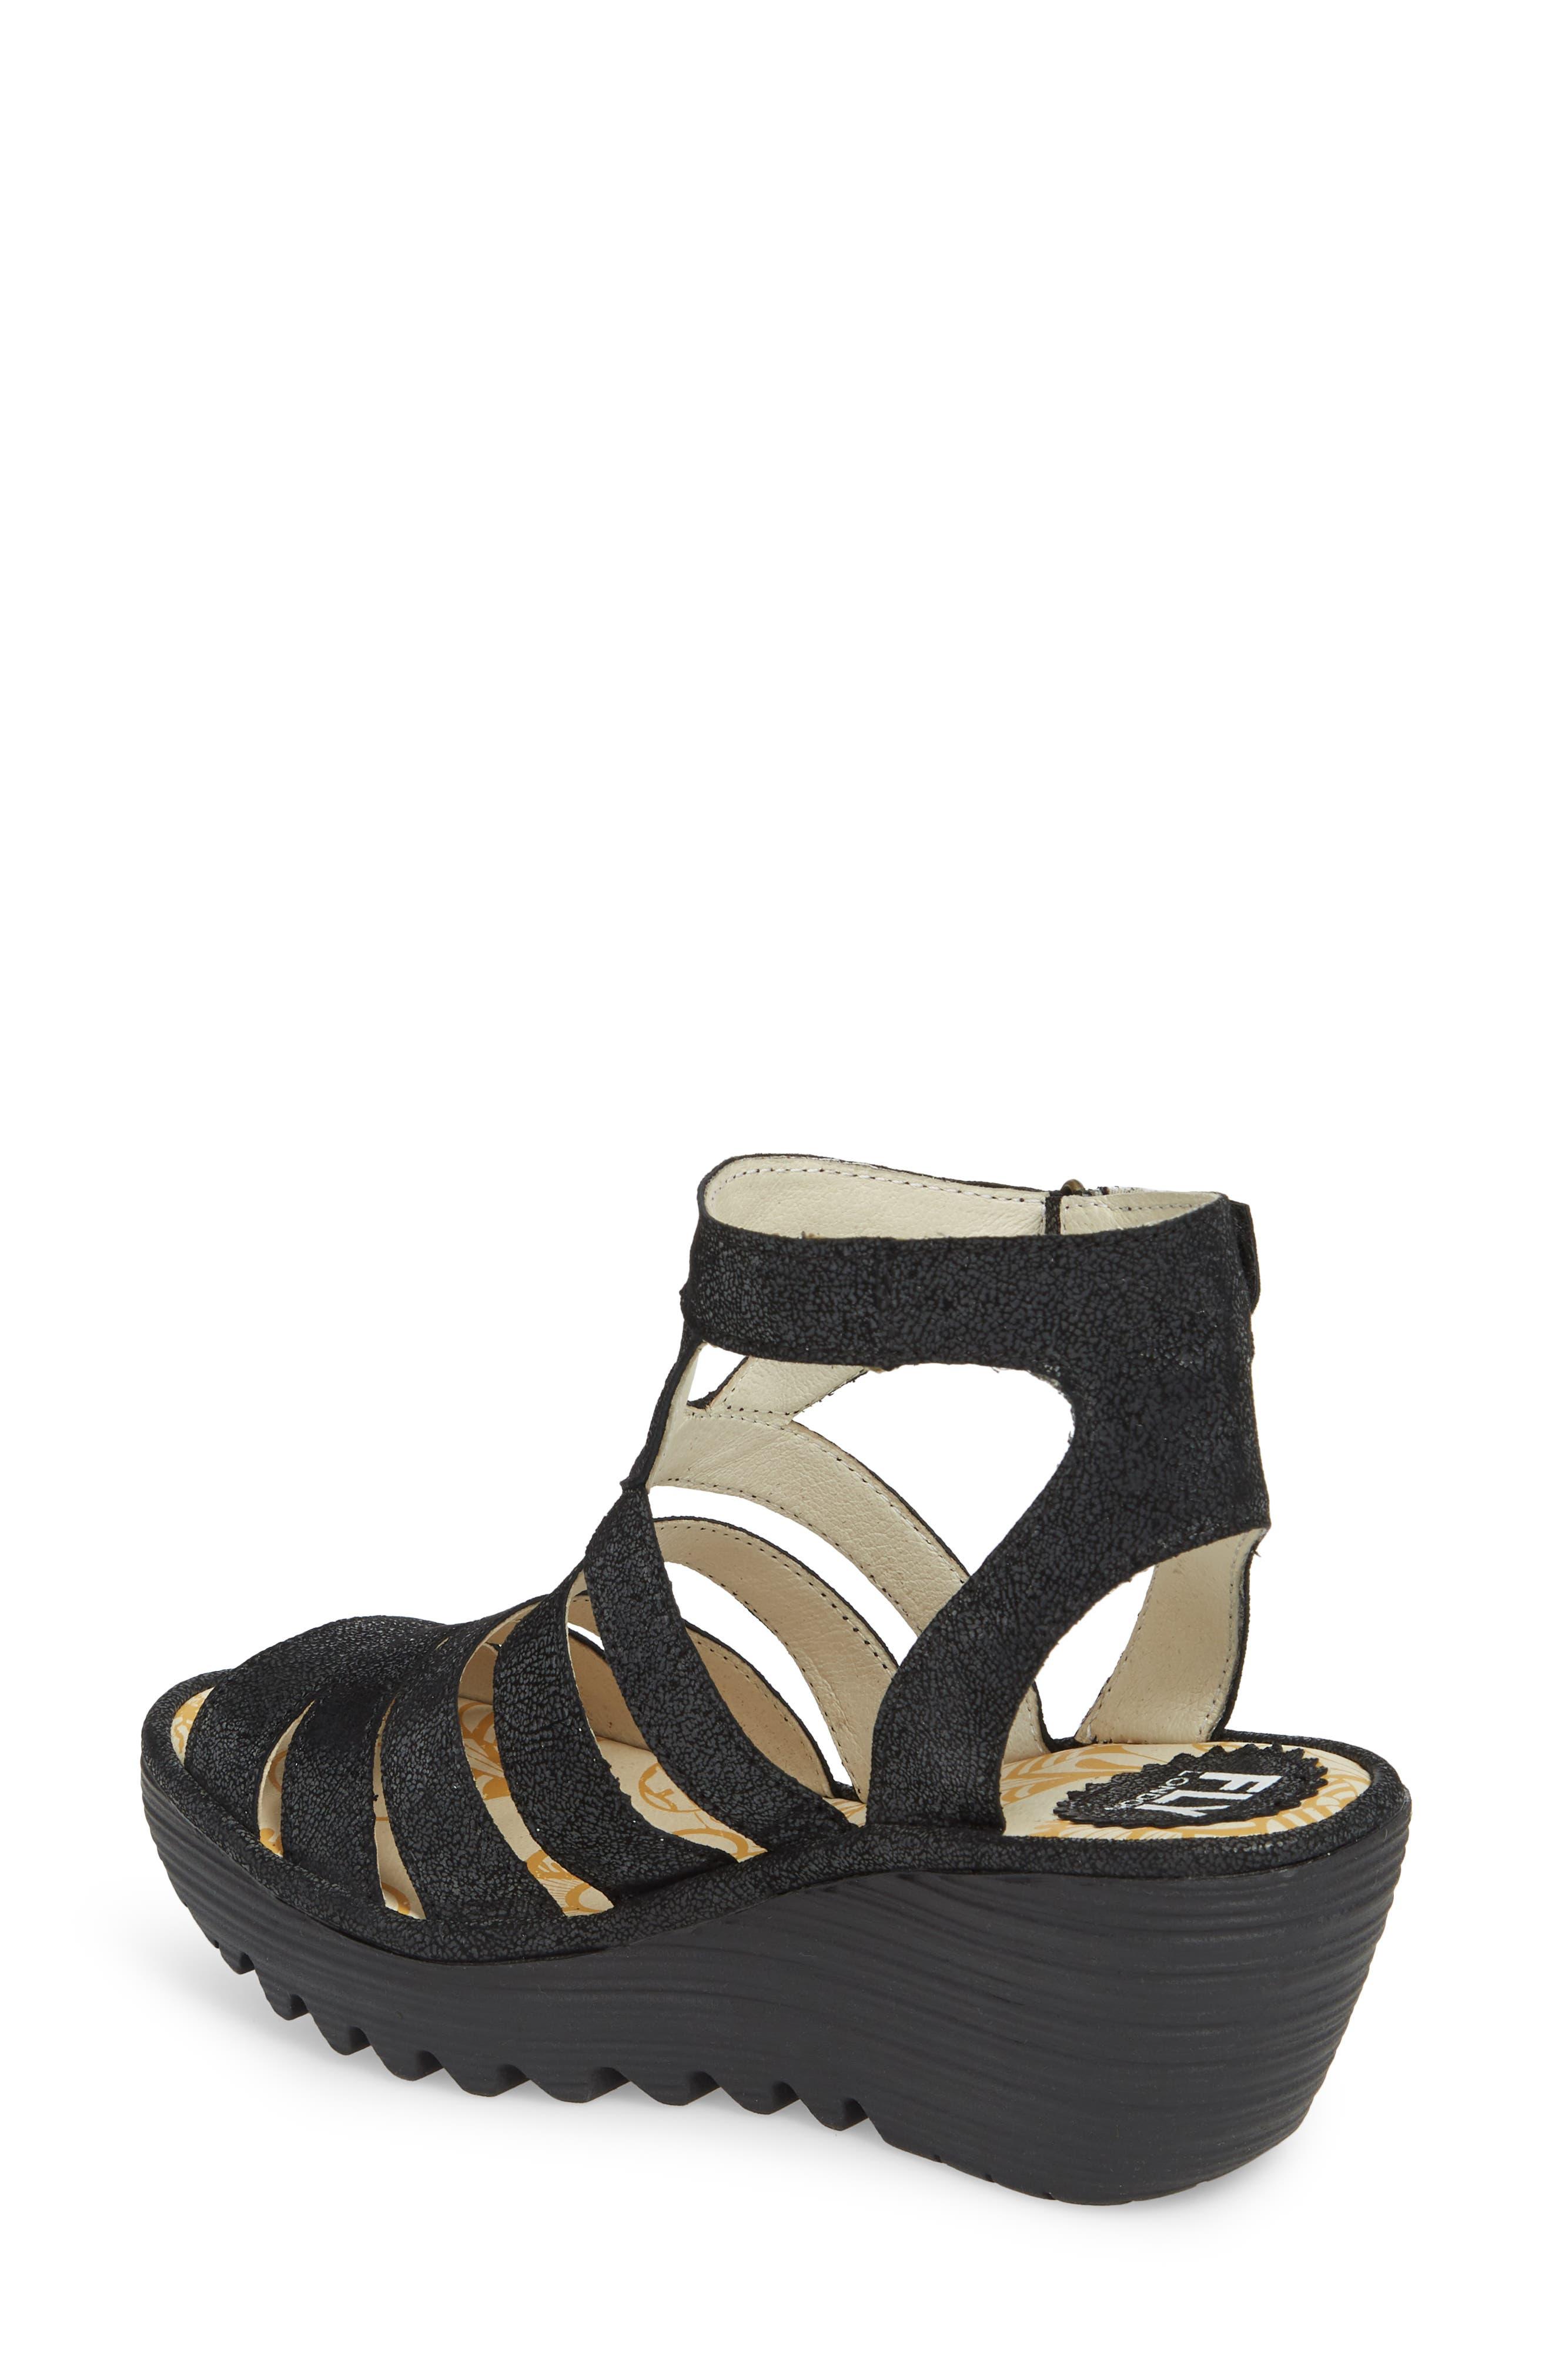 FLY LONDON, Yeba Wedge Sandal, Alternate thumbnail 2, color, BLACK LEATHER